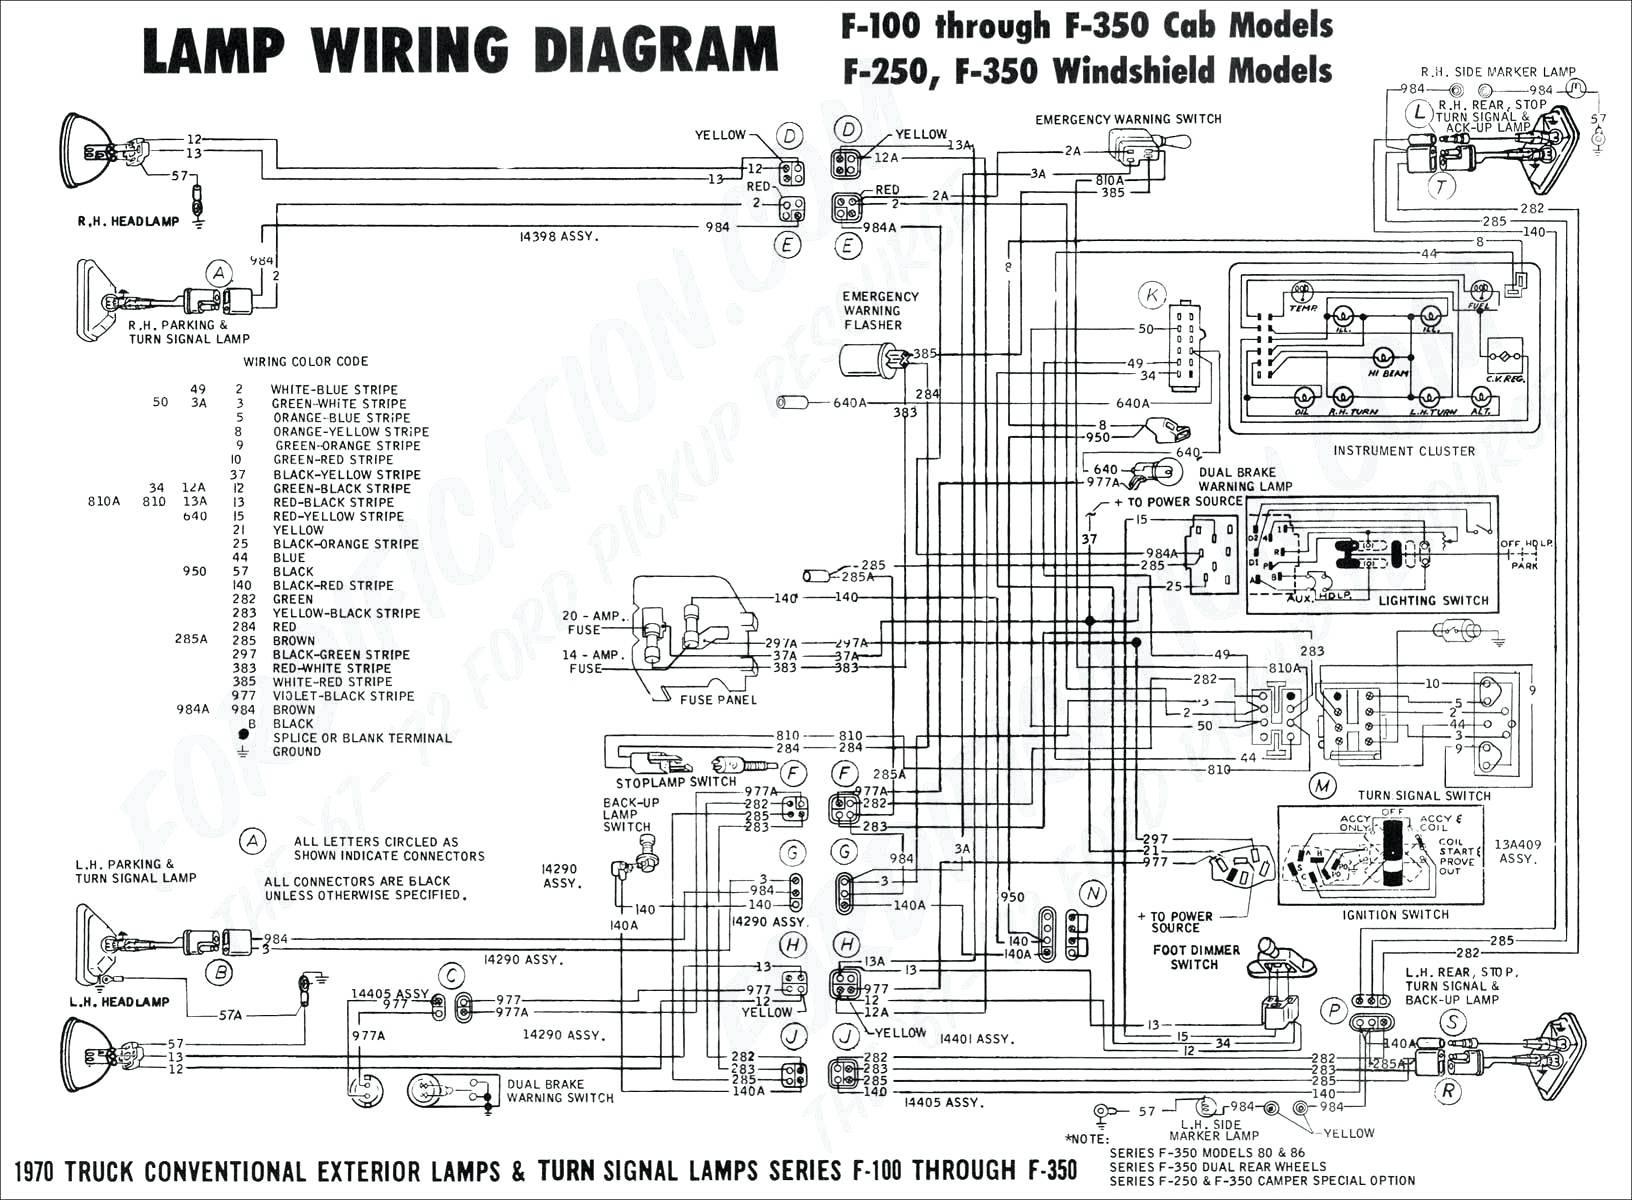 Gentex Mirror Wiring Diagram Em 5350] Razor Electric Scooter Wiring Diagram as Well Razor Of Gentex Mirror Wiring Diagram